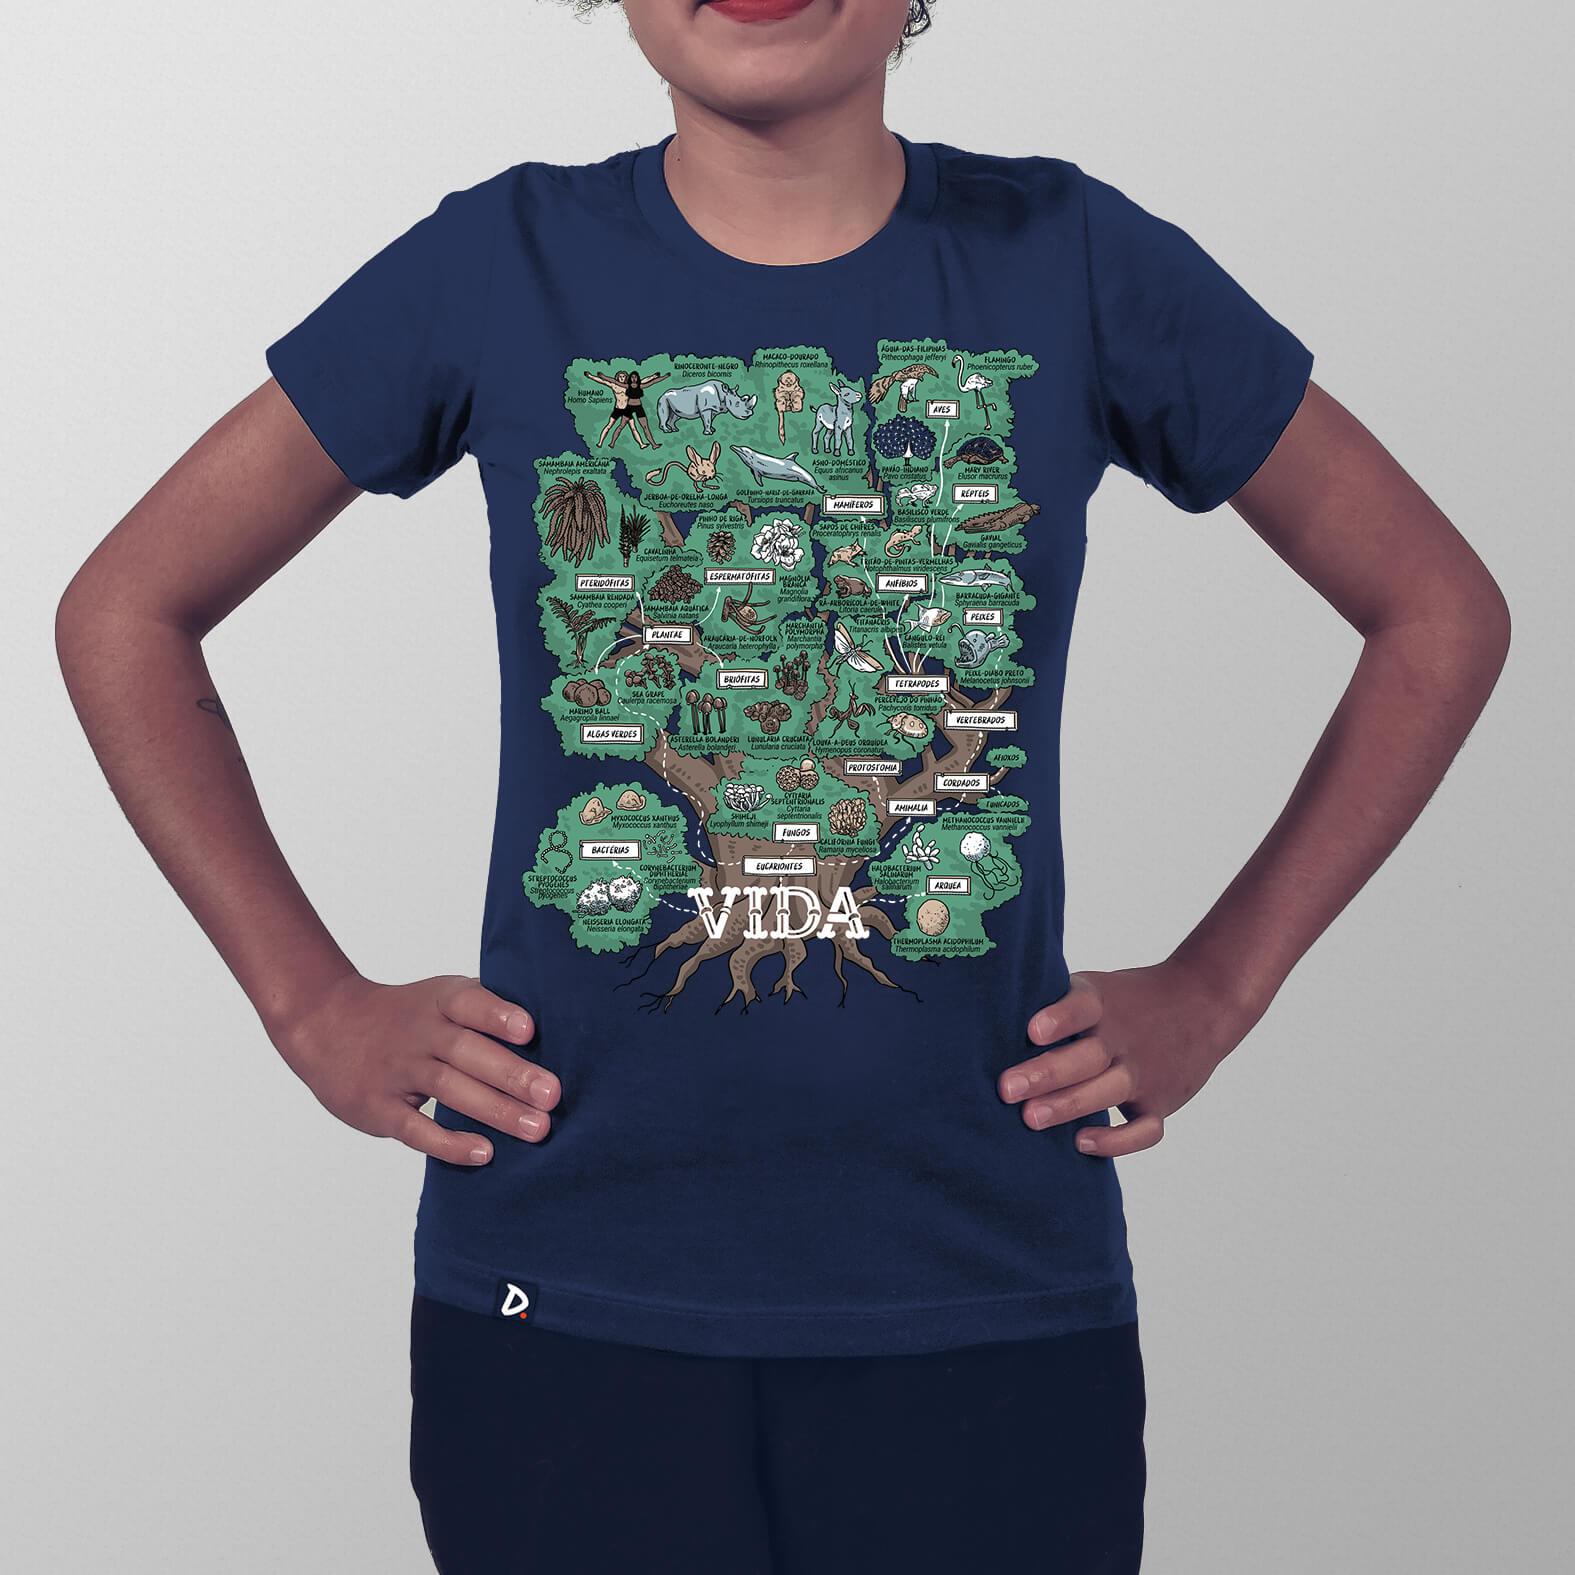 Camiseta Feminina Árvore da Vida